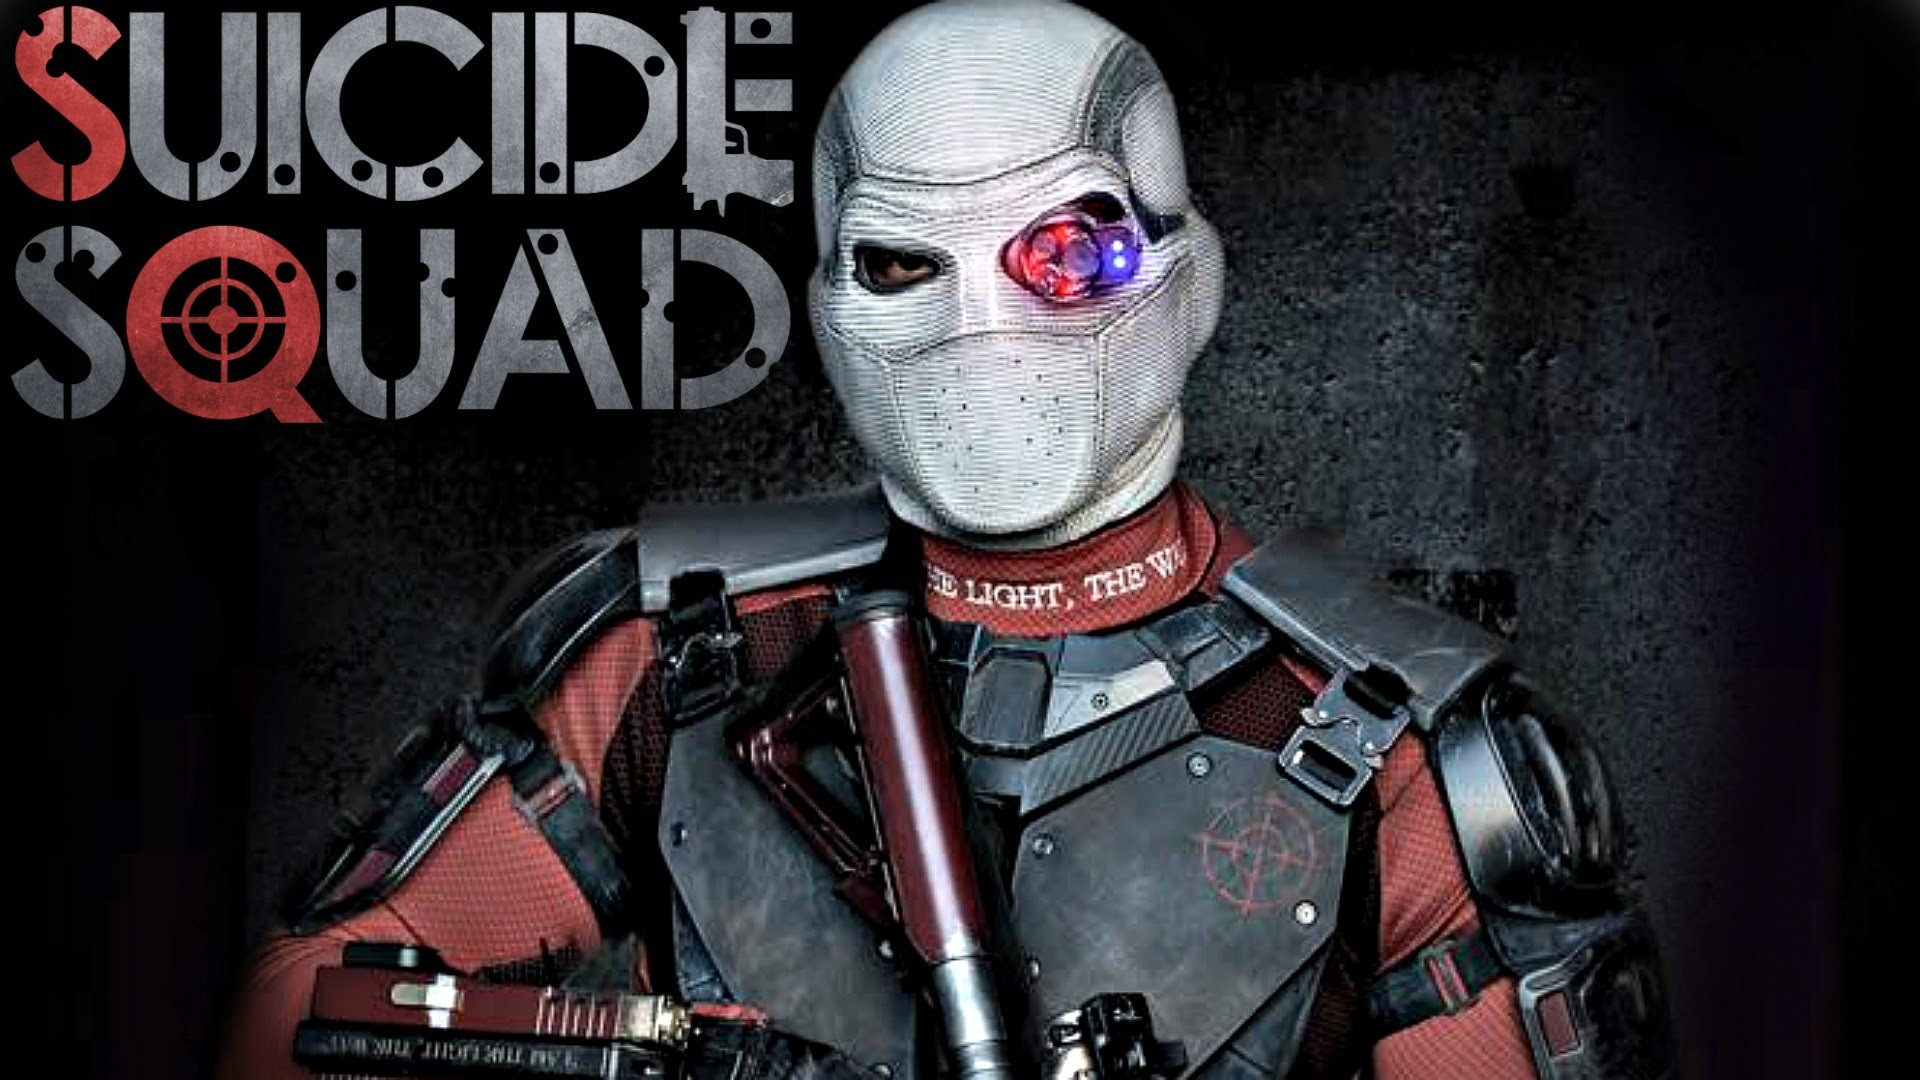 Will Smith Suicide Squad 2016 wallpaper https://free4kwallpapers.com/ wallpaper/movies/will-smith-suicide-squad-2016/OG7p   Desktop Wallpapers    Pinterest …